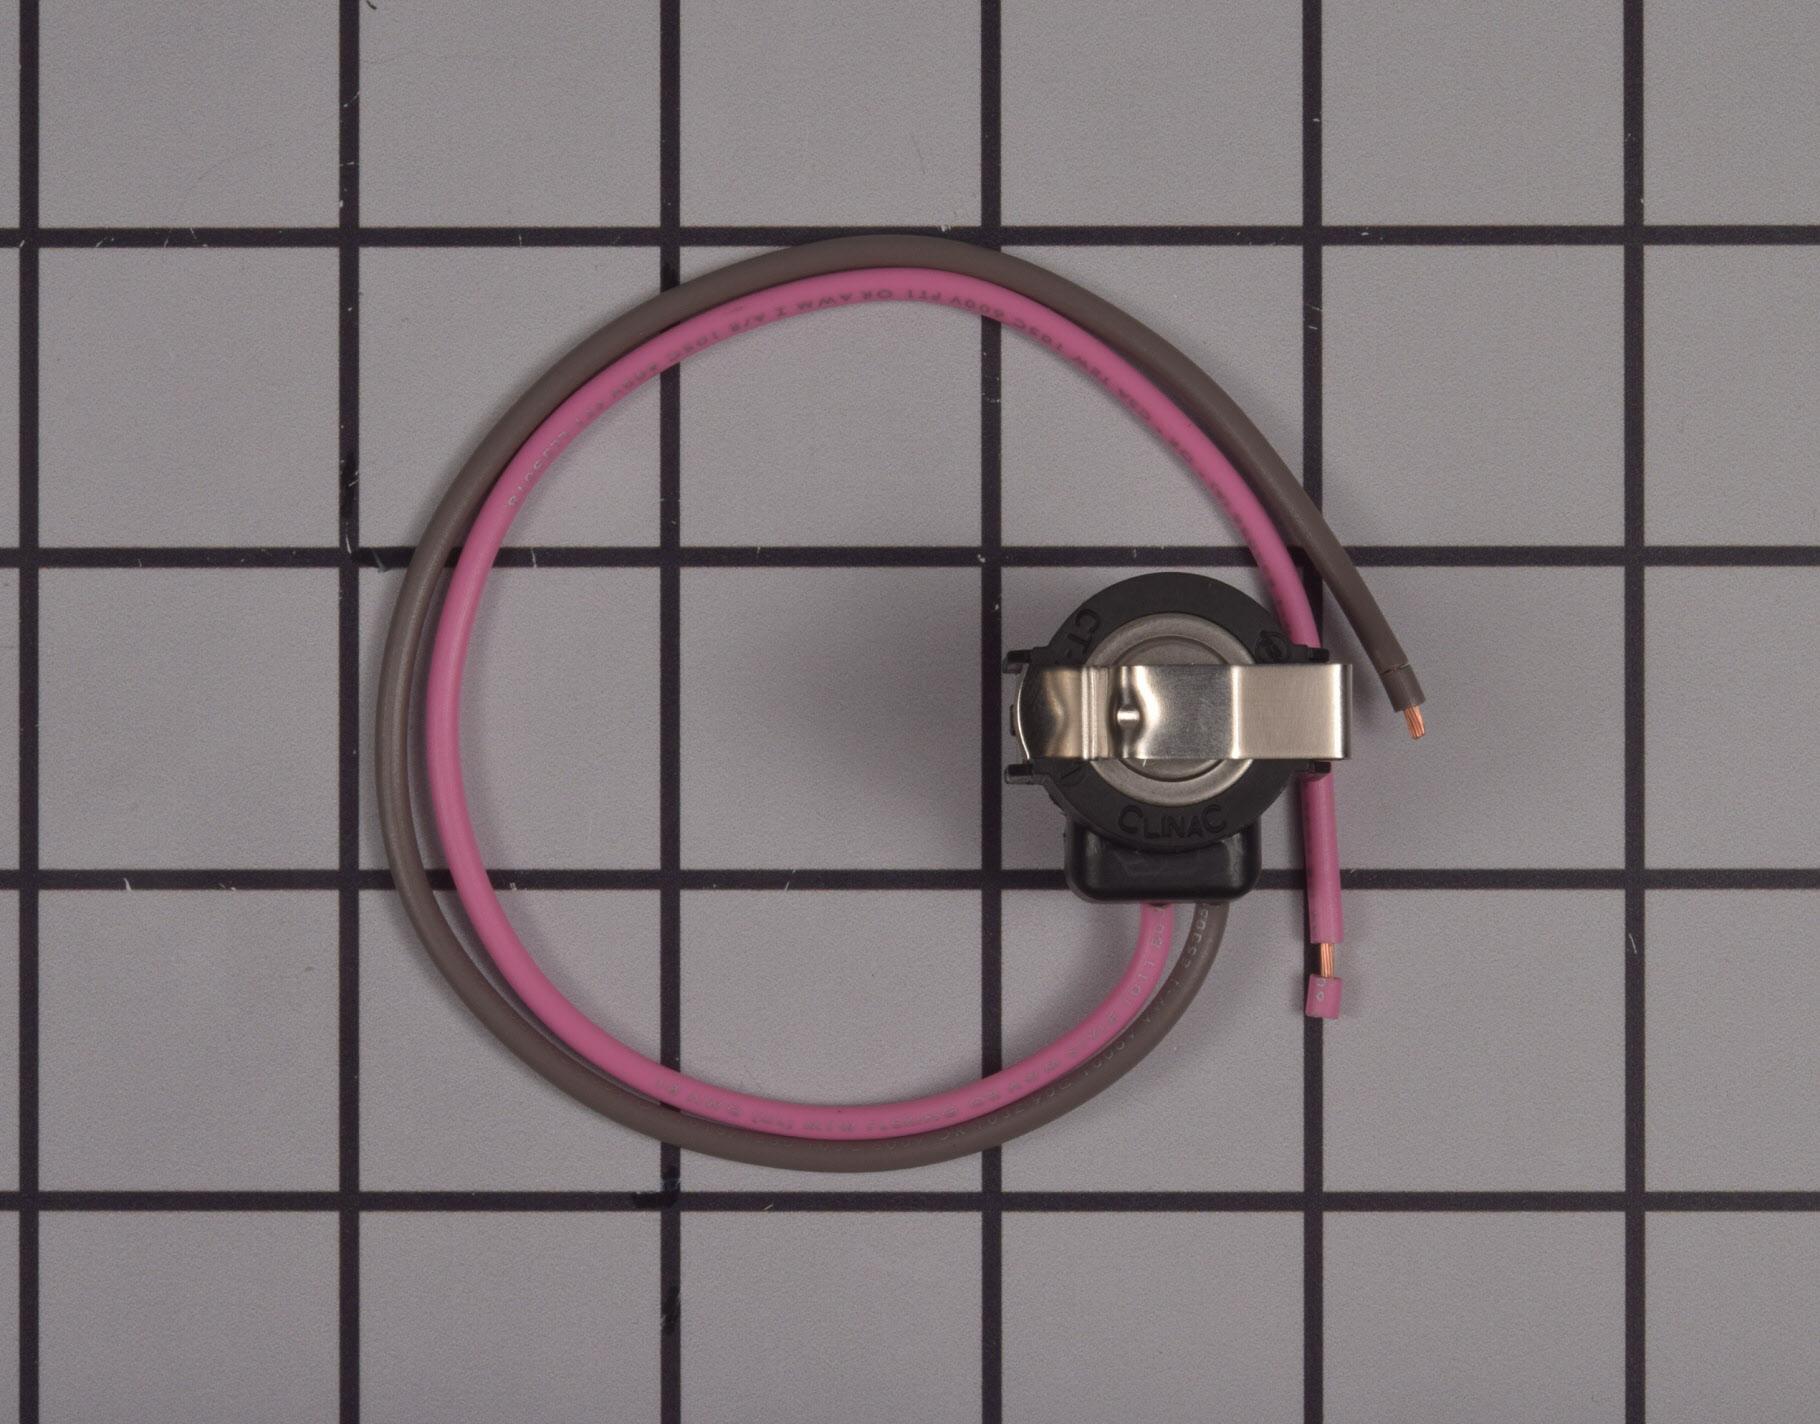 Whirlpool Refrigerator Part # WPW10225581 - Defrost Thermostat